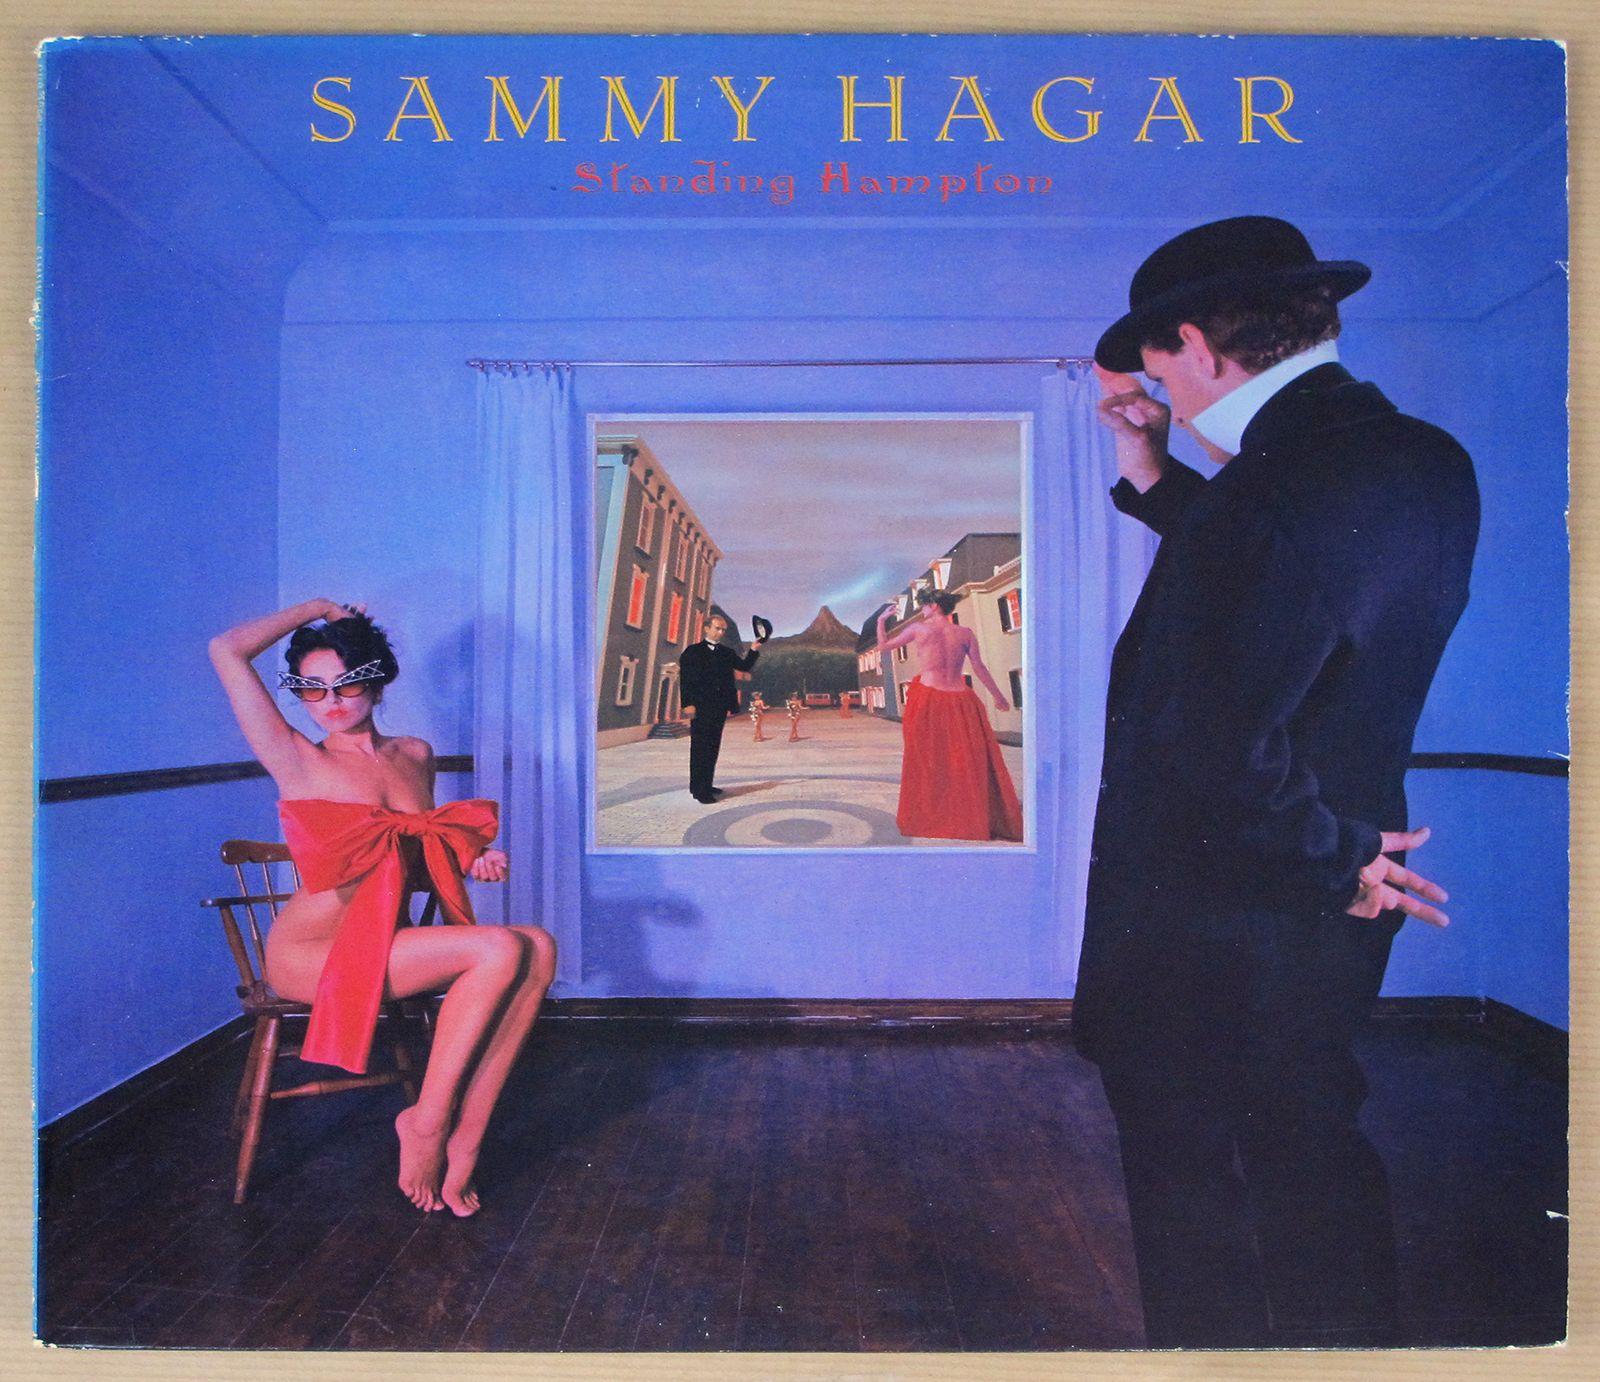 Sammy Hagar Standing Sammy Hagar Album Covers Rock Album Covers